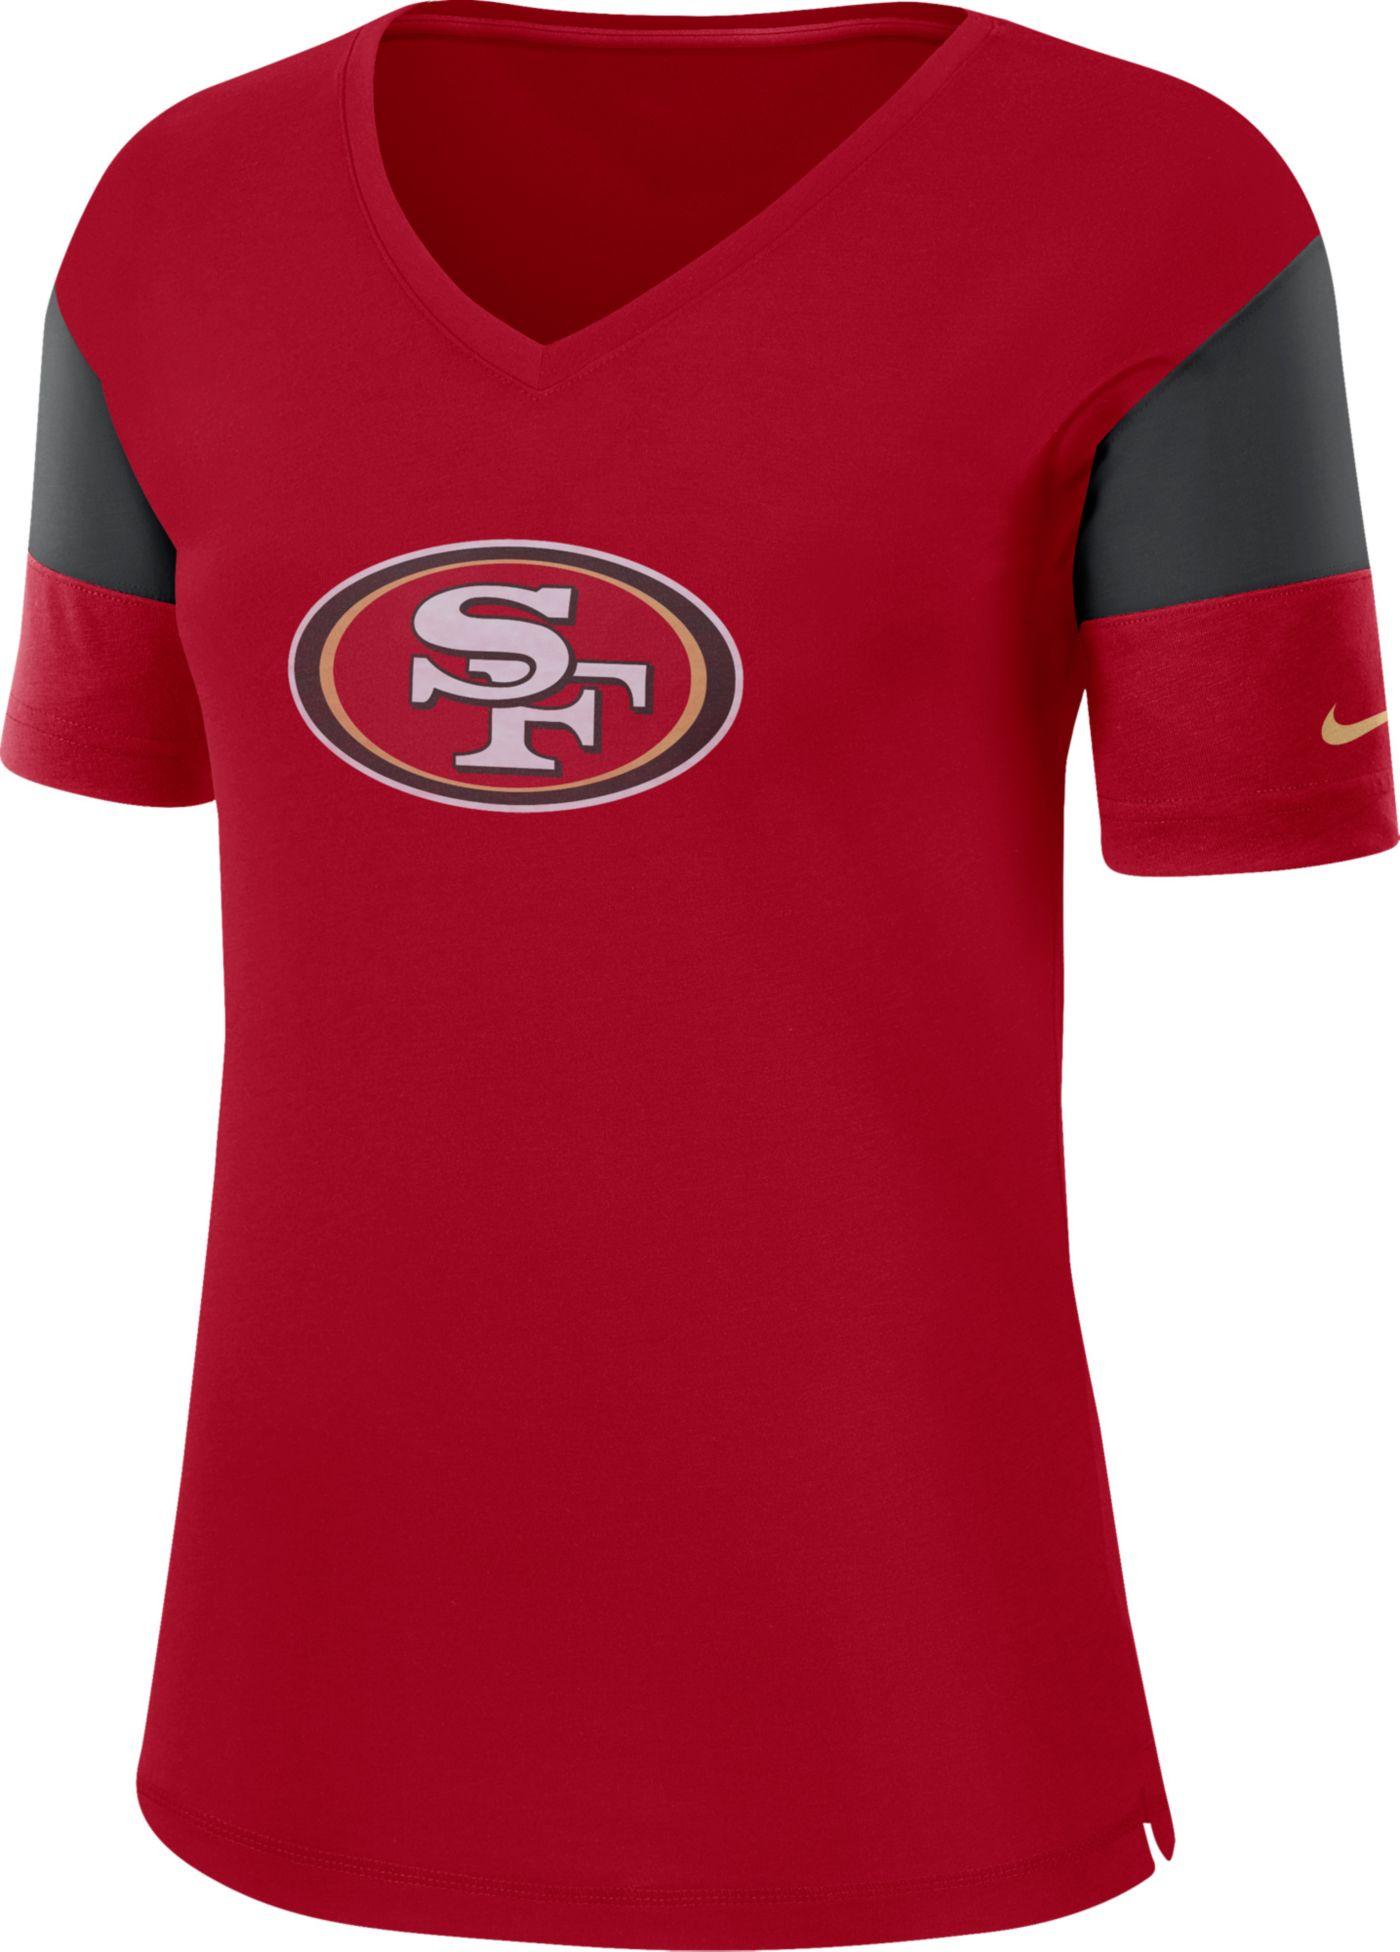 Nike Women's San Francisco 49ers Breathe Red V-Neck T-Shirt